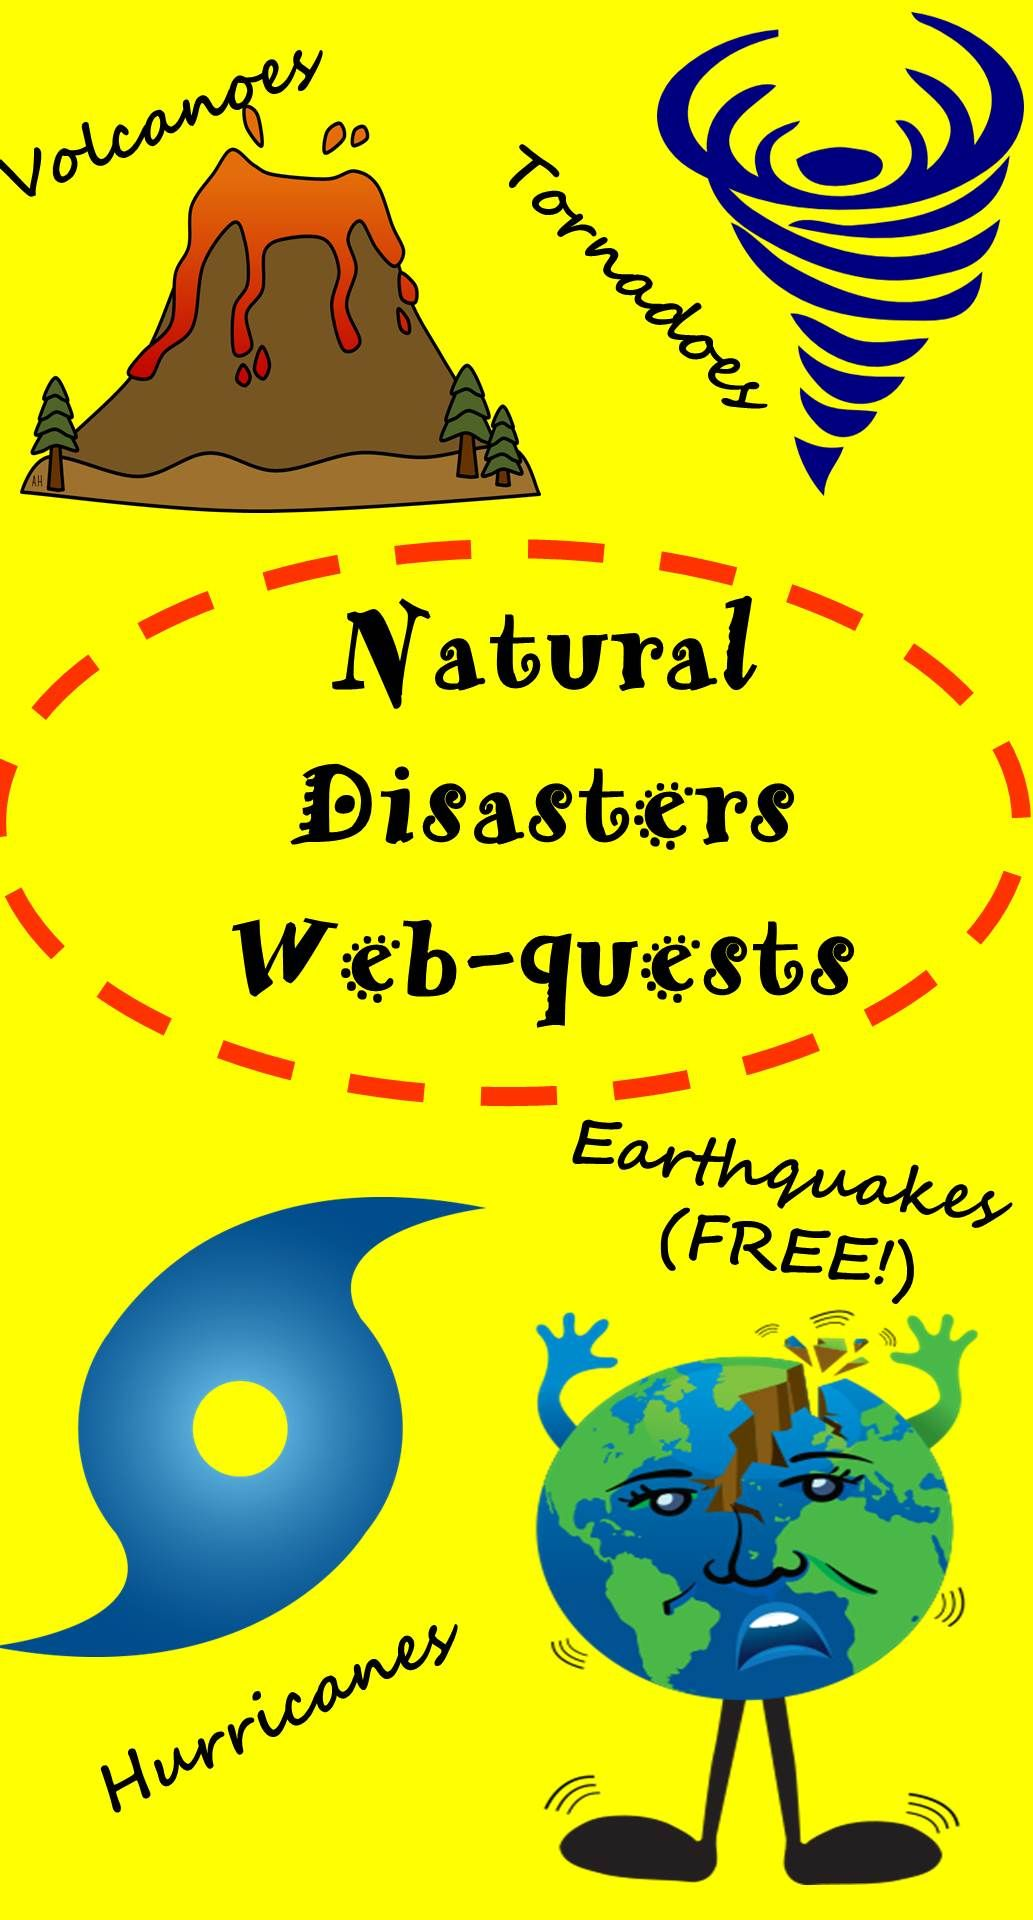 Natural Disaster Webquests